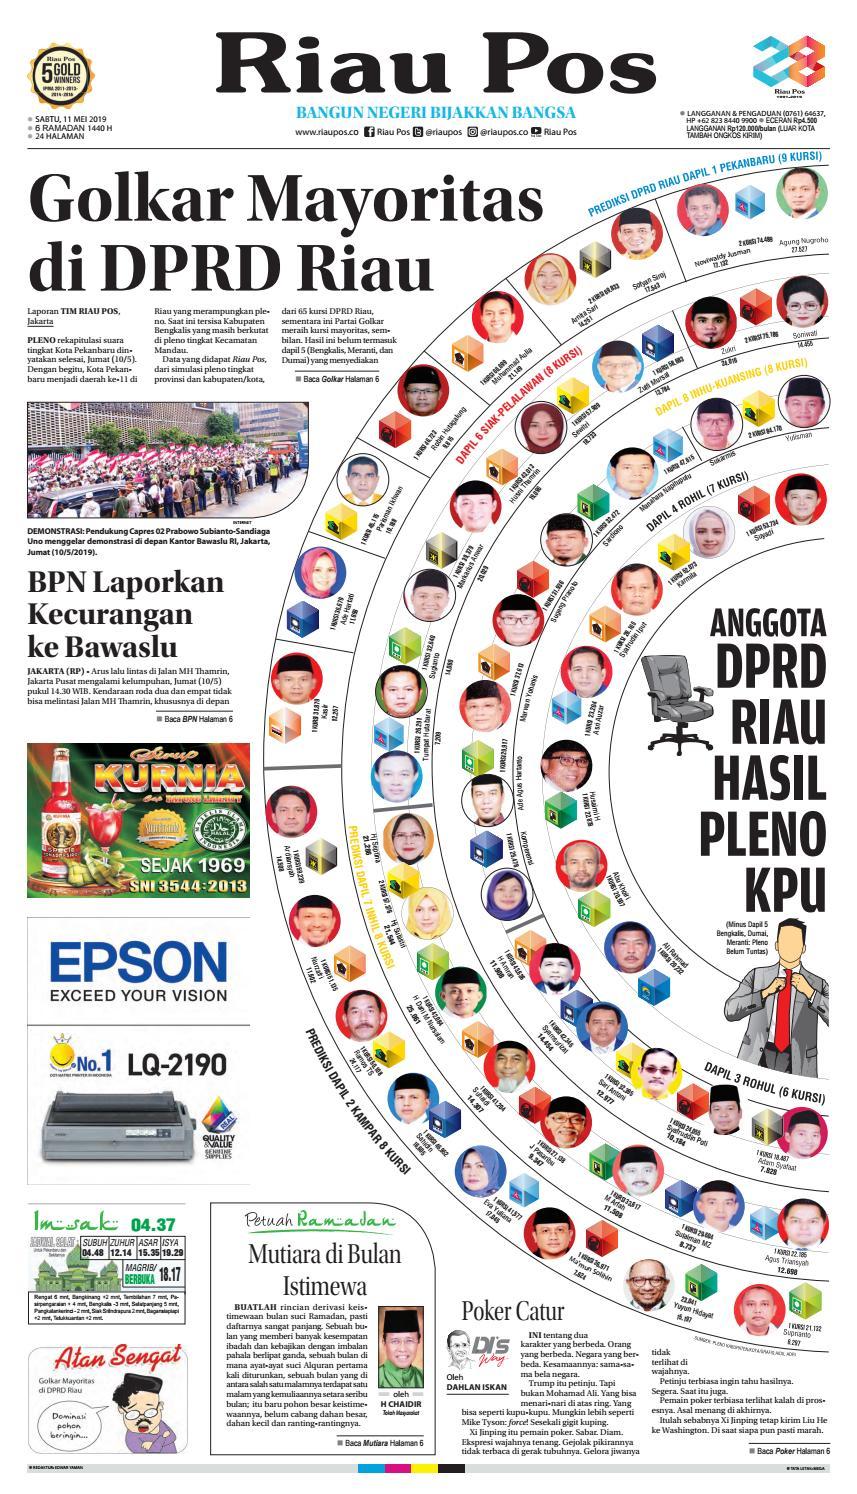 Riaupos Edisi Sabtu 11 Mei 2019 by Riau Pos issuu